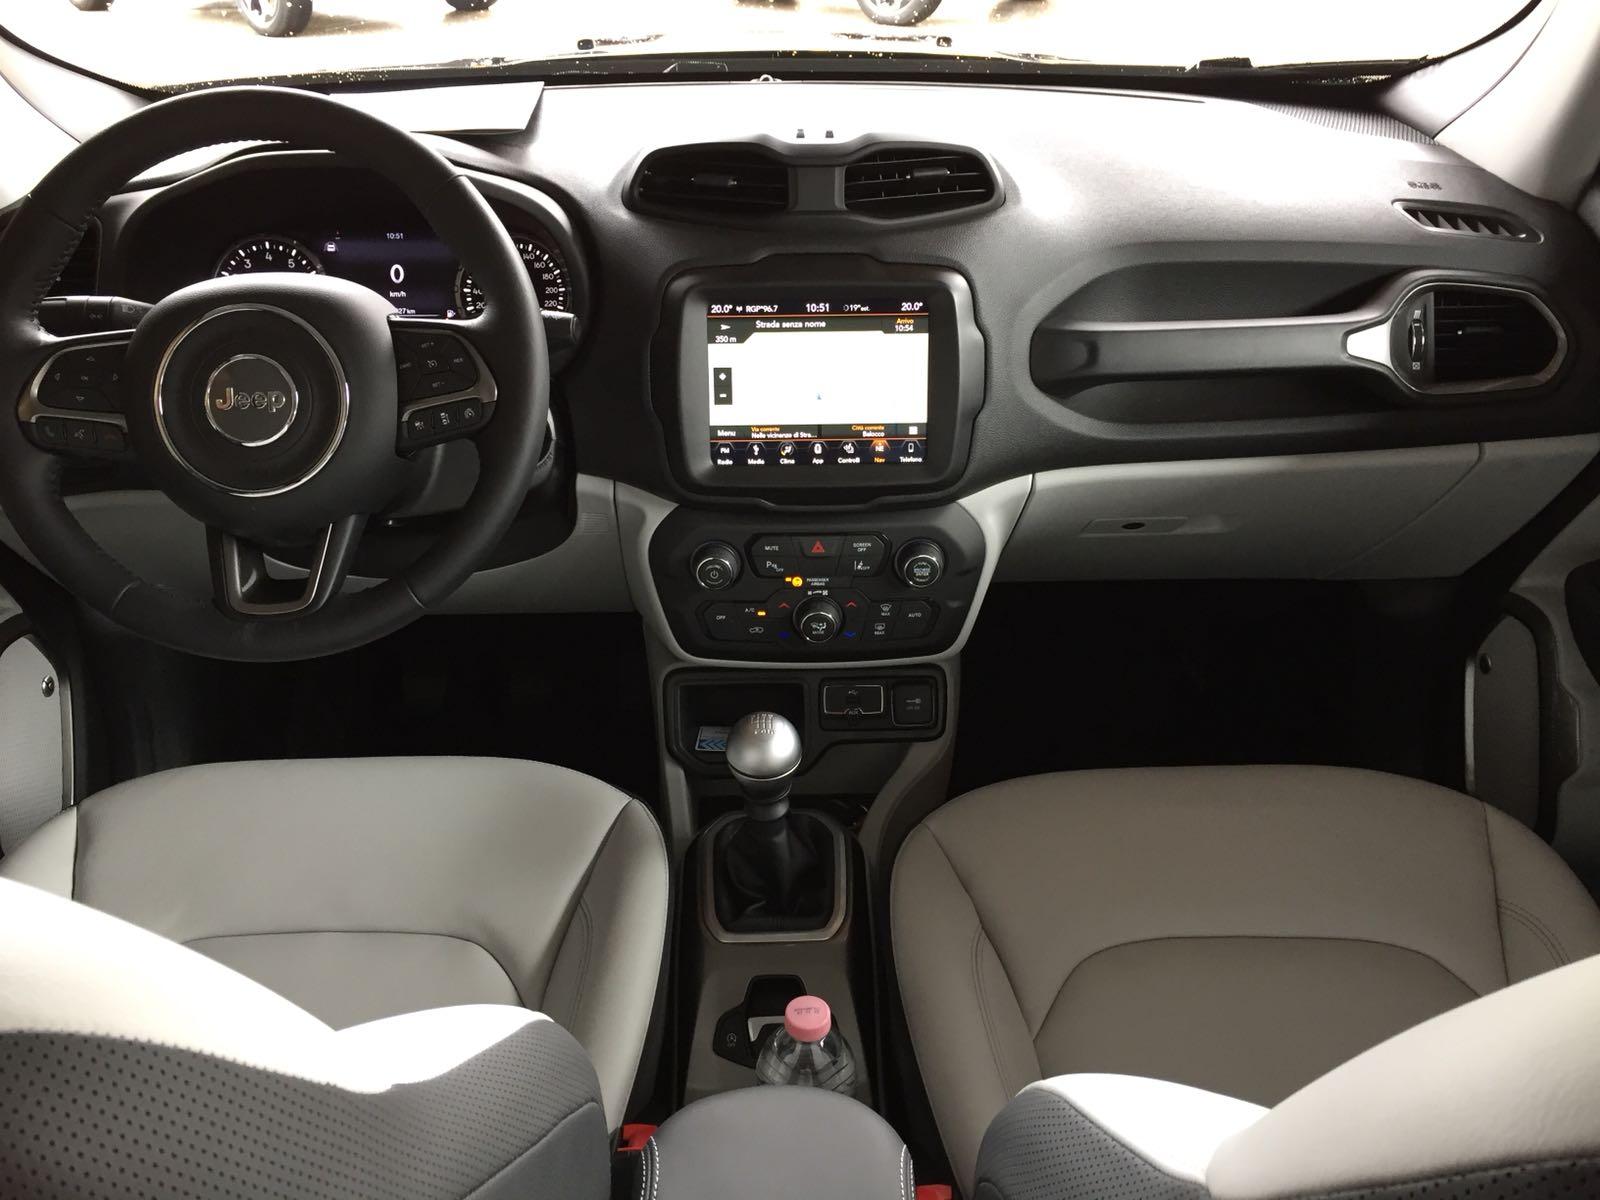 nuova-jeep-renegade-2019-interni-sedili-anteriori